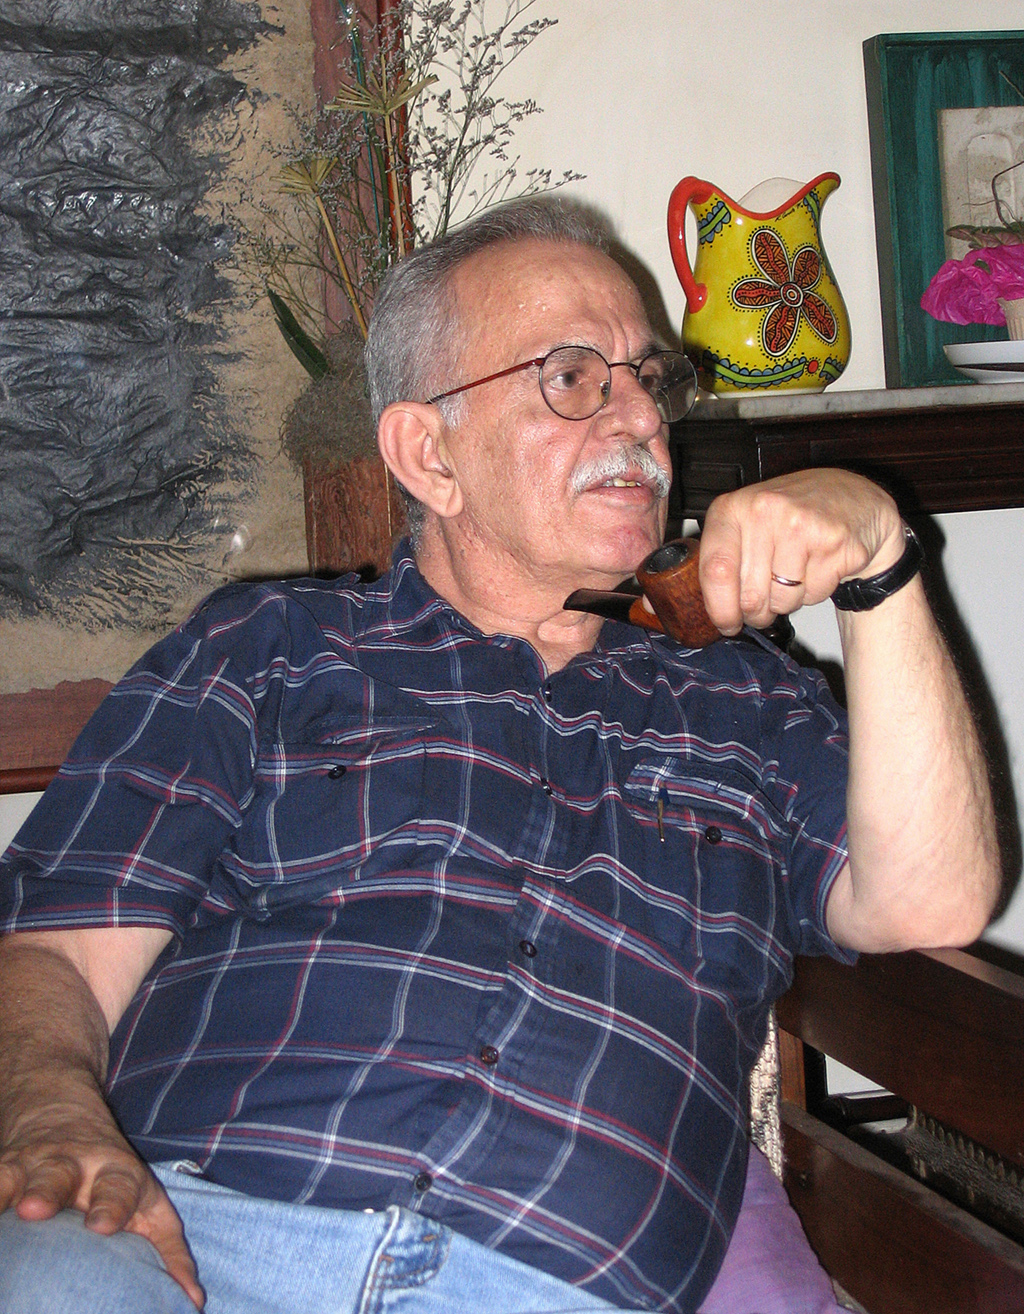 João Alexandre Barbosa